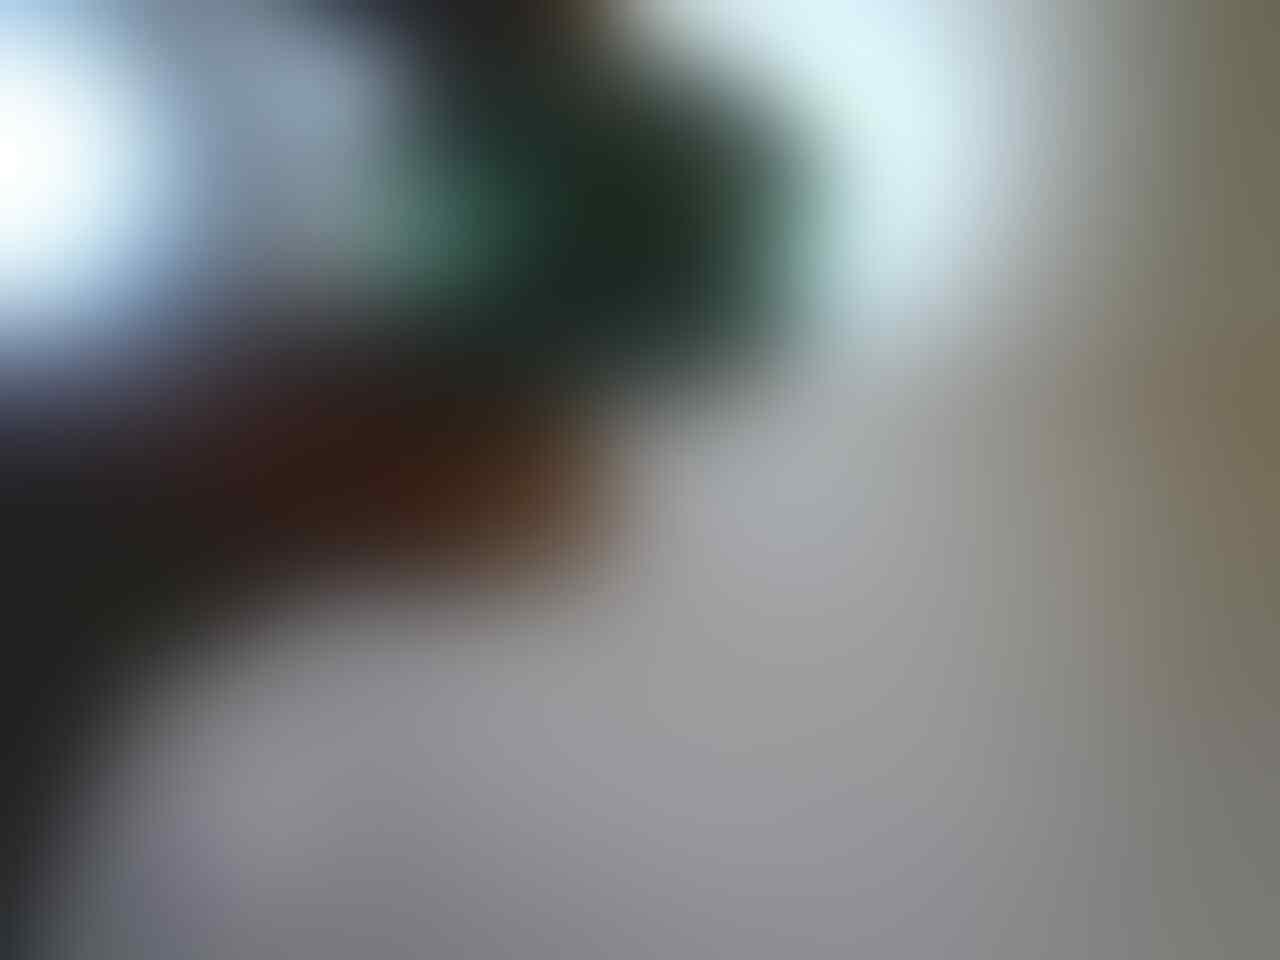 WTS Obsidian Dark Green & Bio Solar Body Glass MURAH BANGET